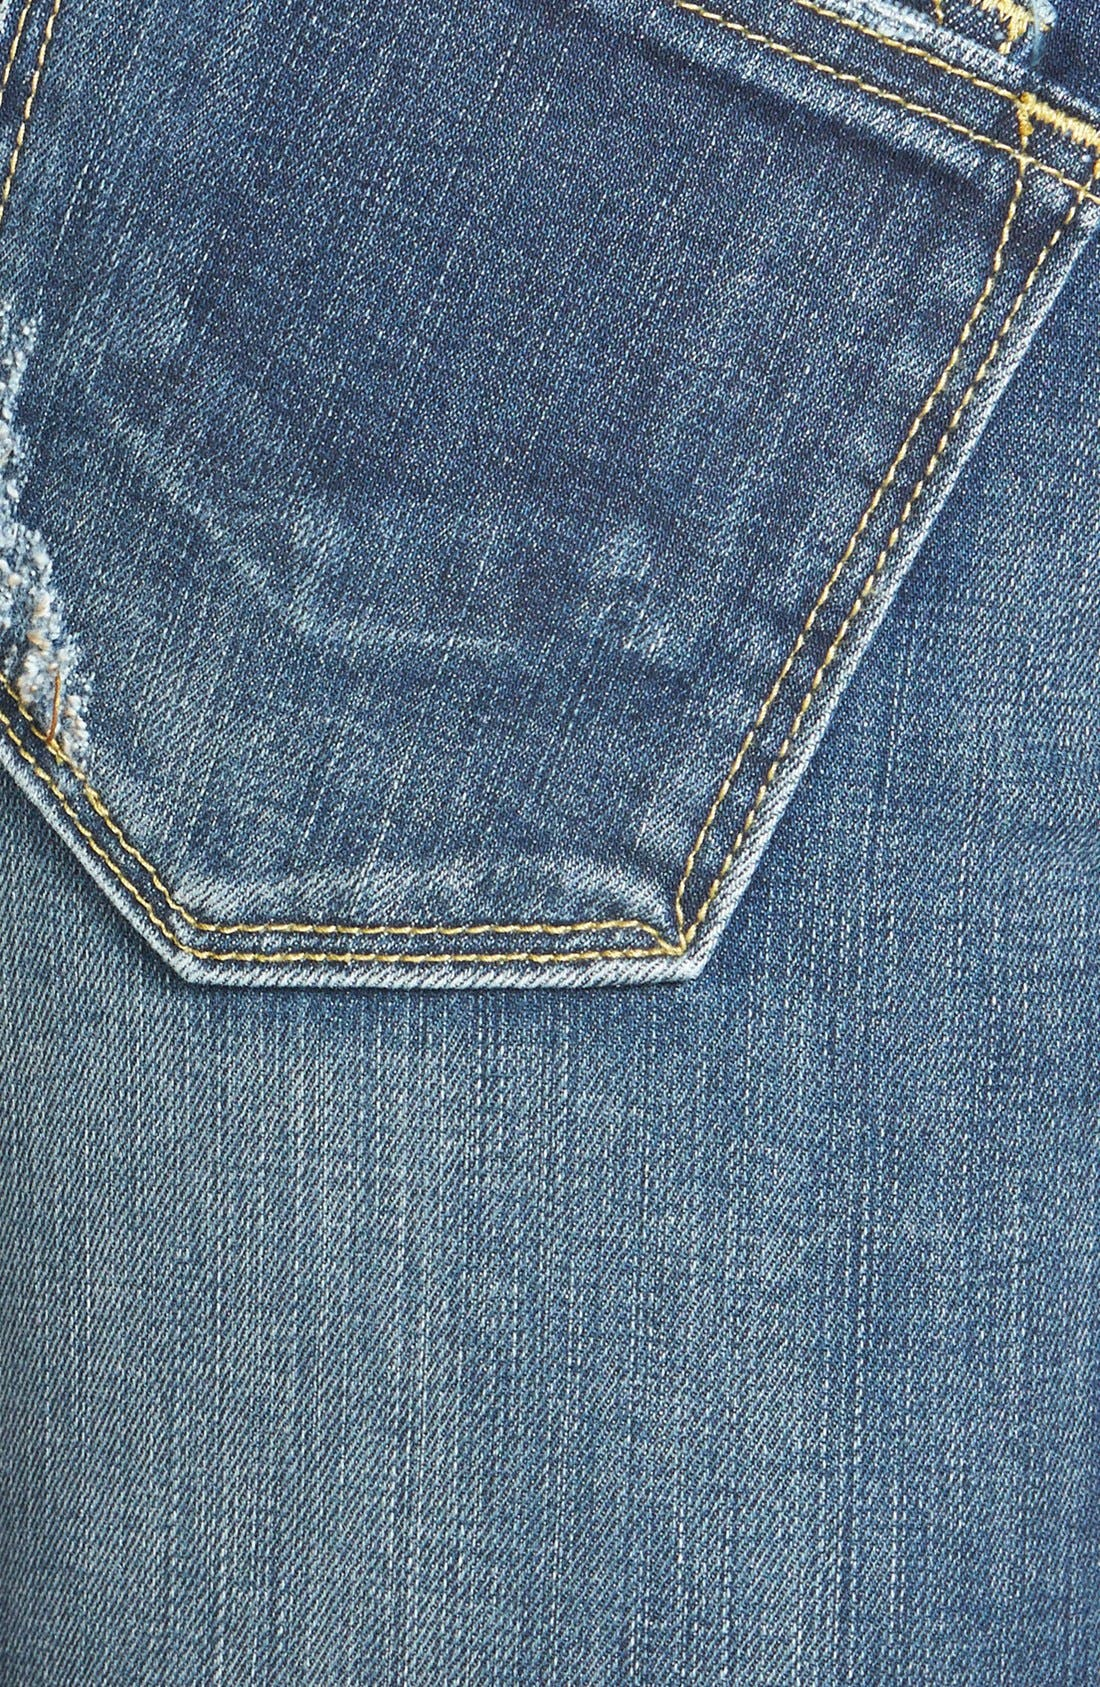 Alternate Image 3  - Vigoss 'Dublin' Distressed Skinny Jeans (Medium Wash)